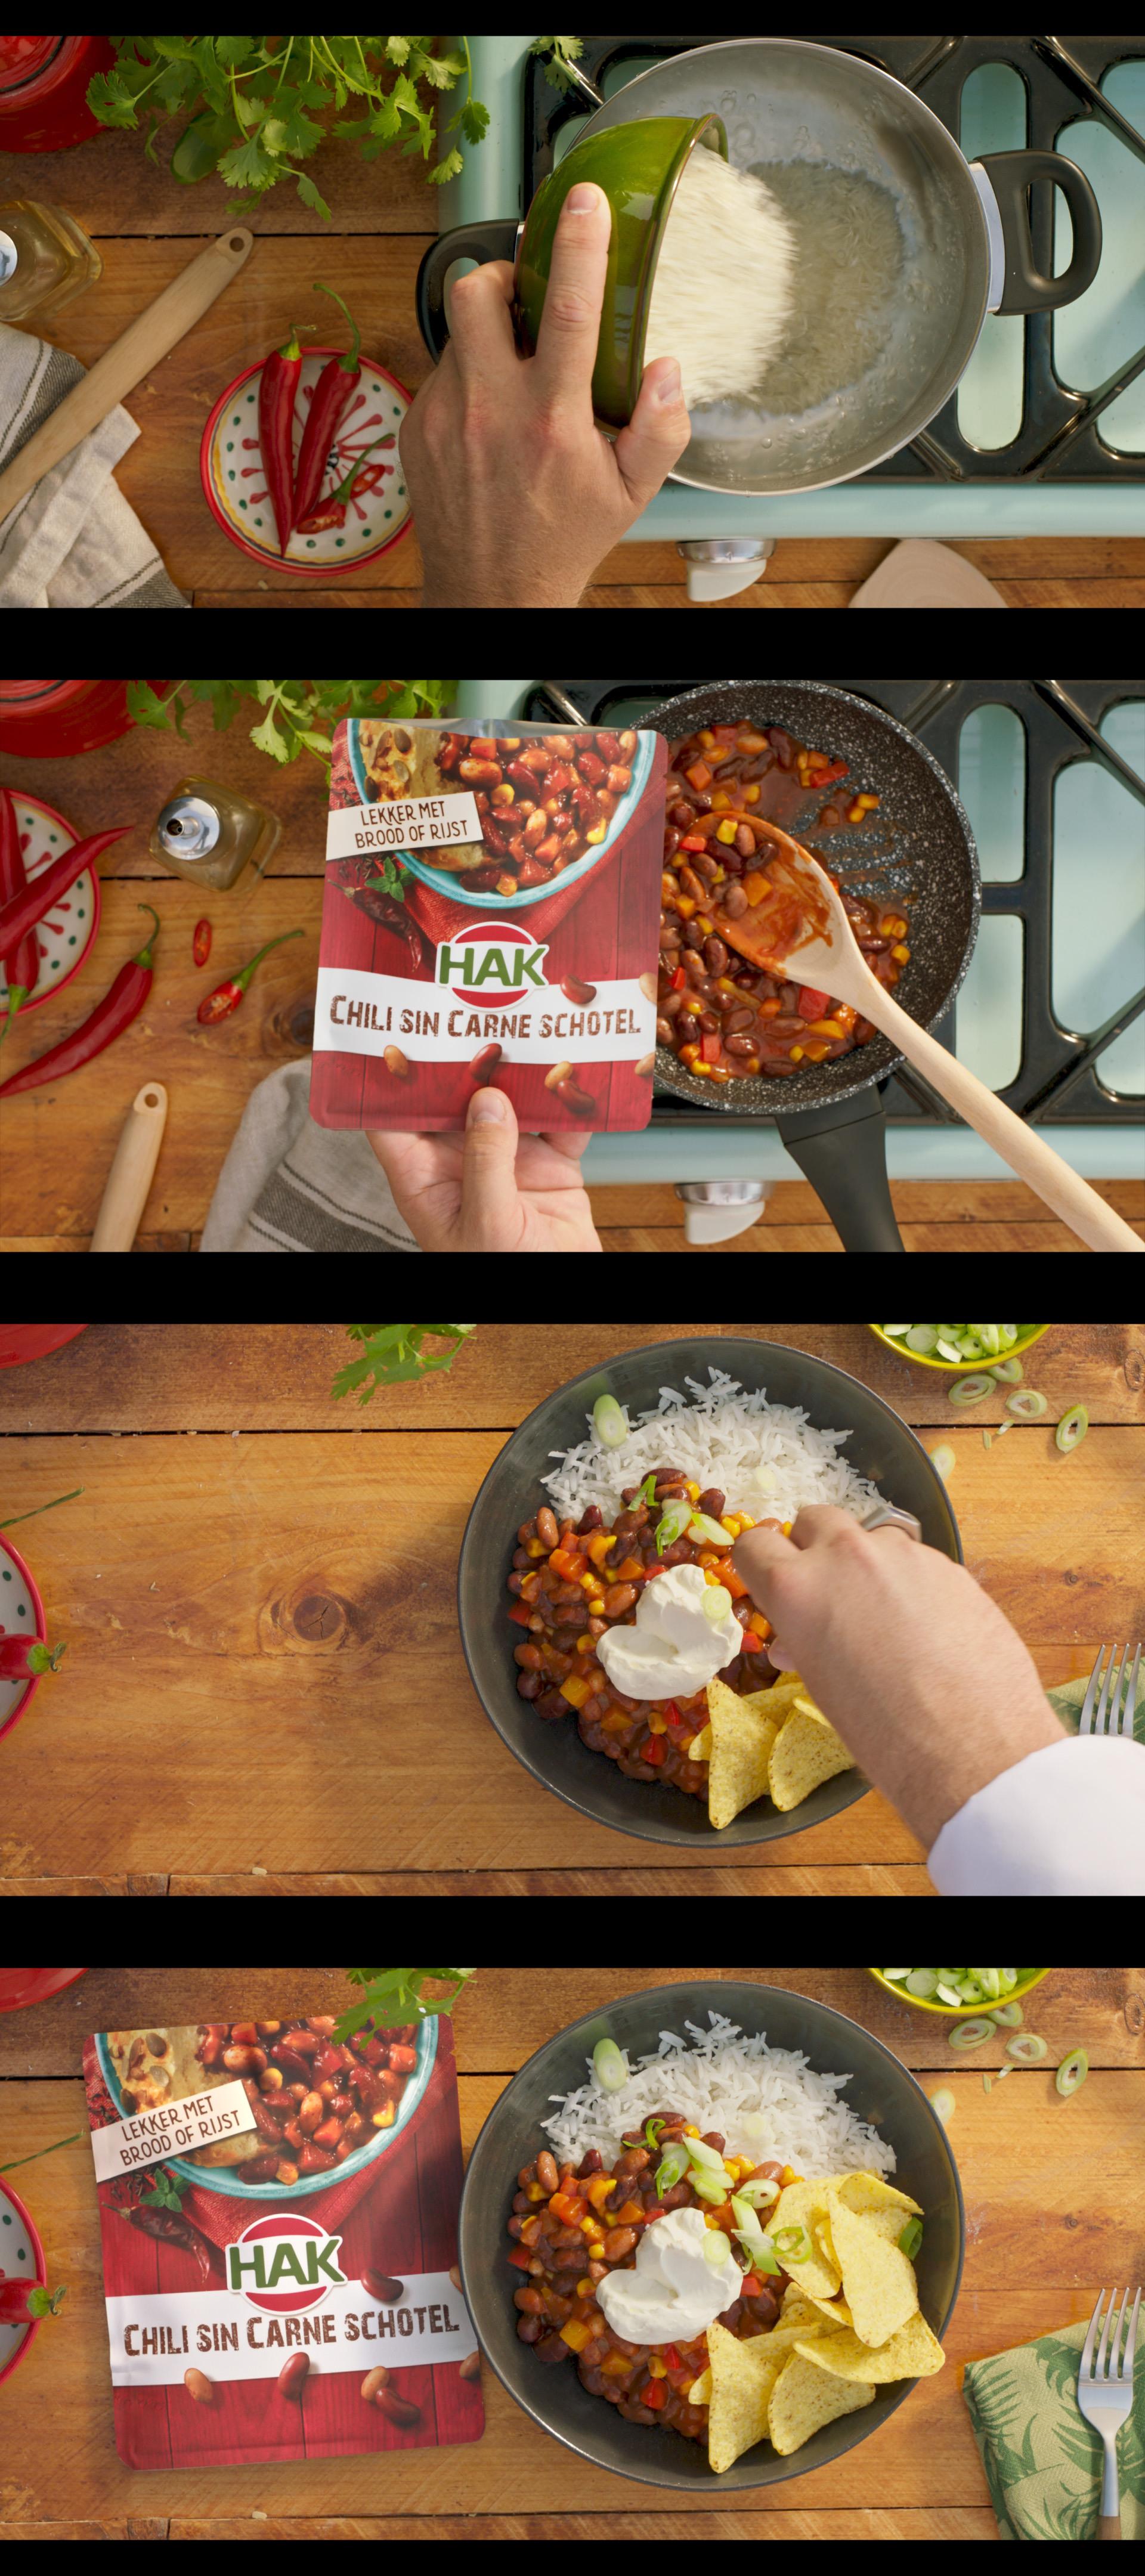 Hak chili sin carne